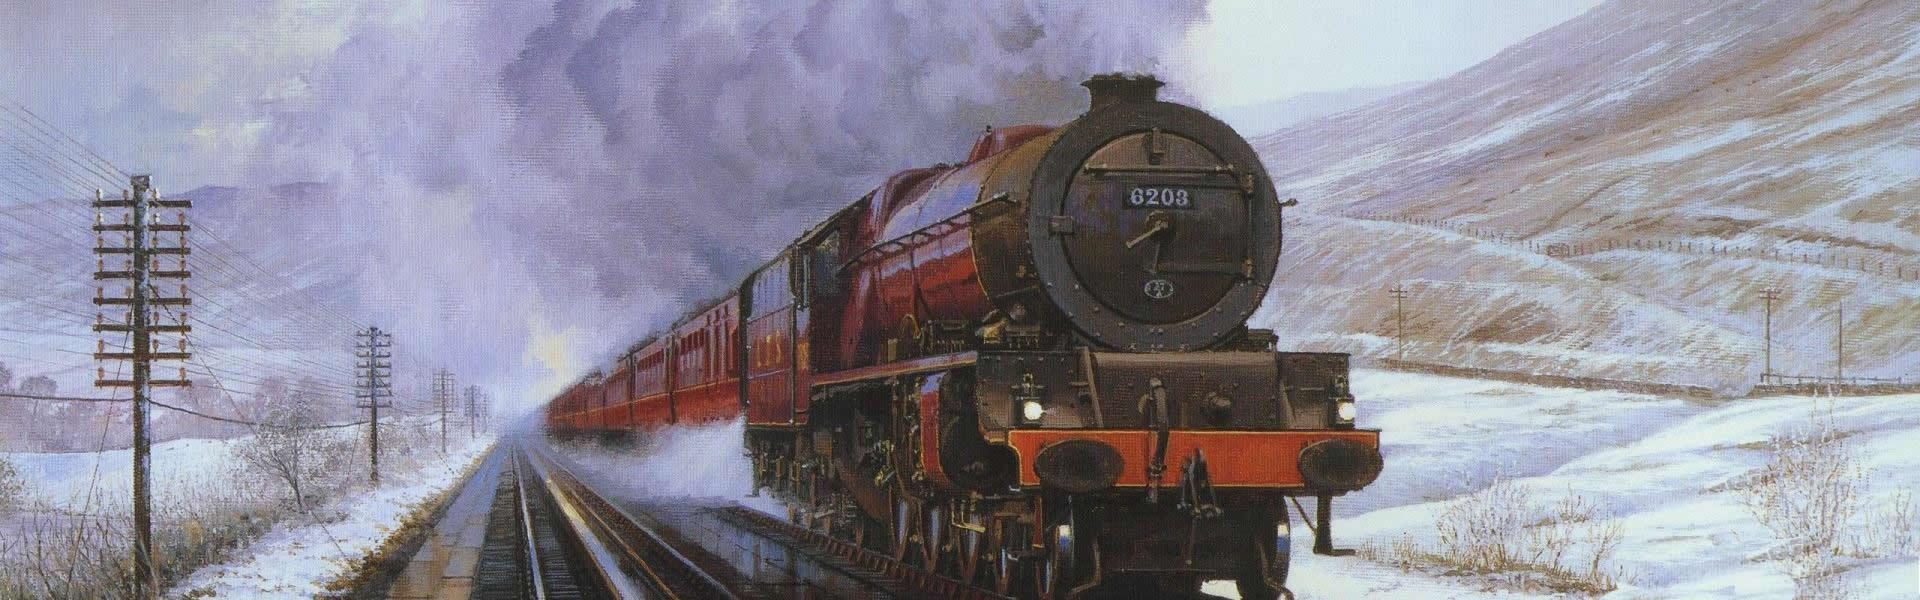 Orario dei treni